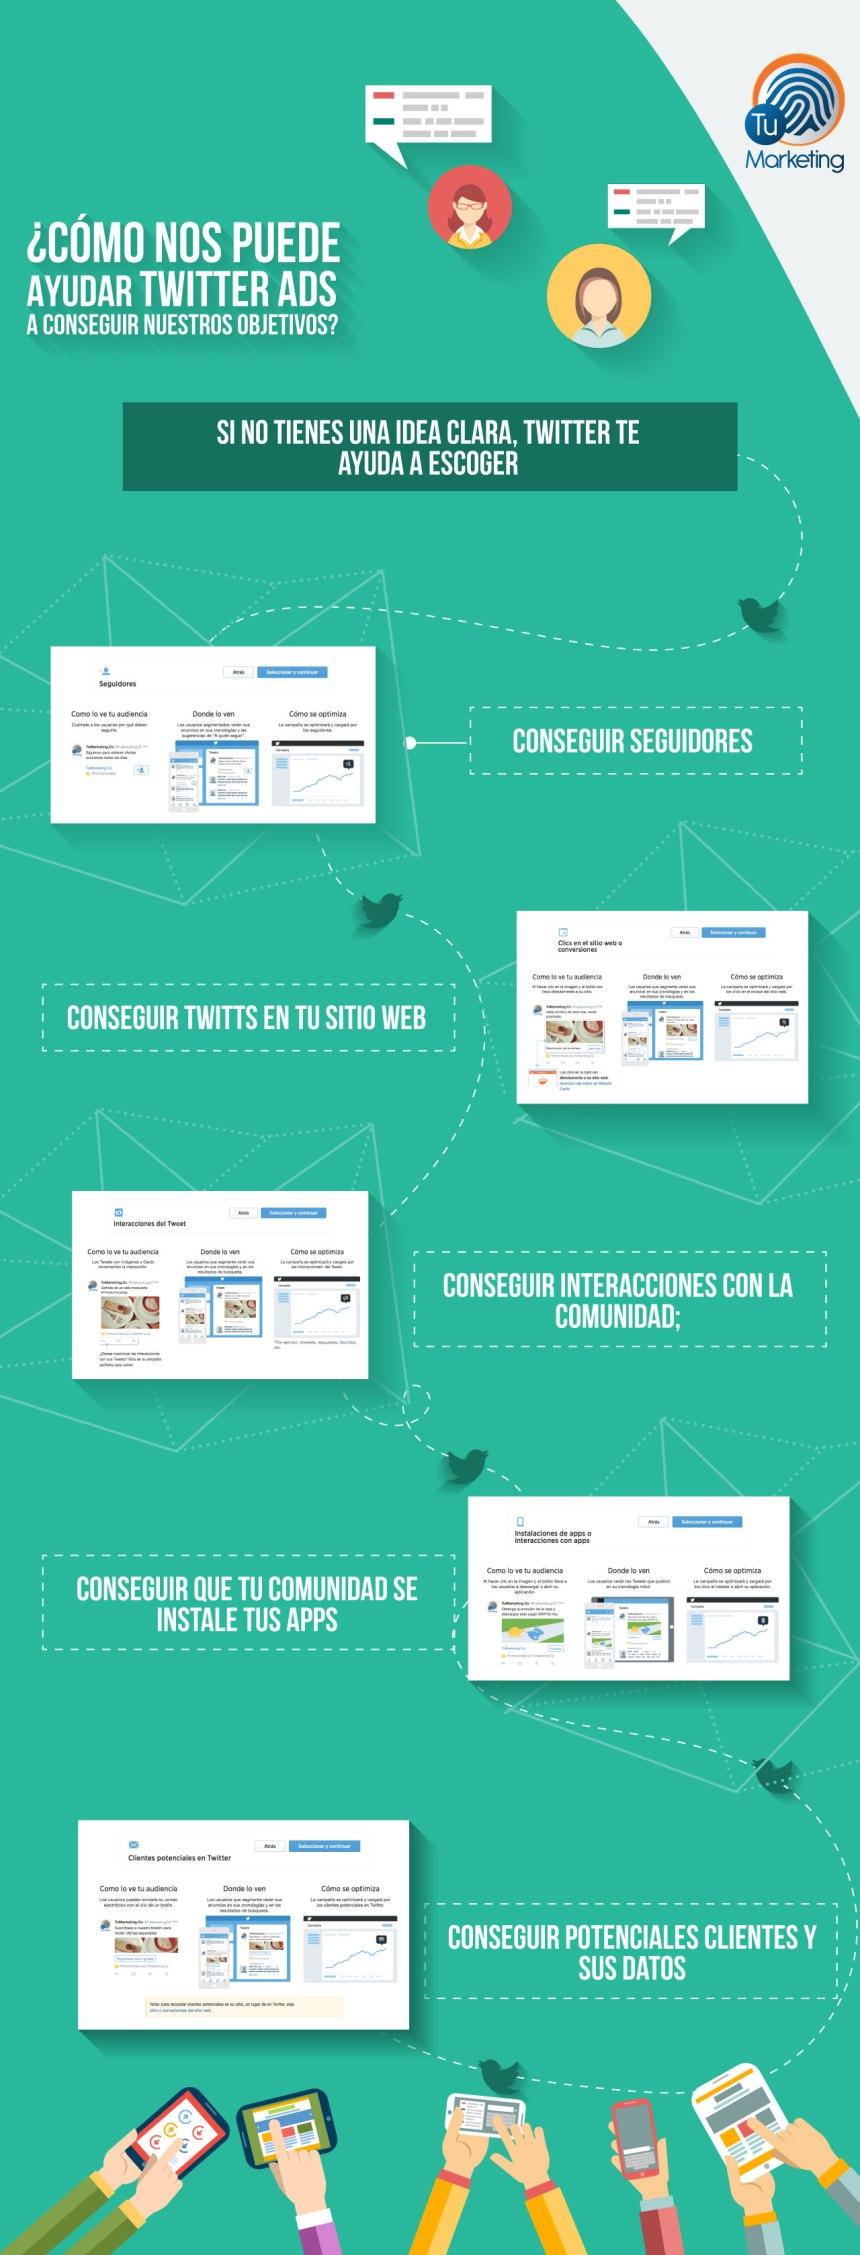 XXCómo empezar a usar Twitter Ads en tu negocio